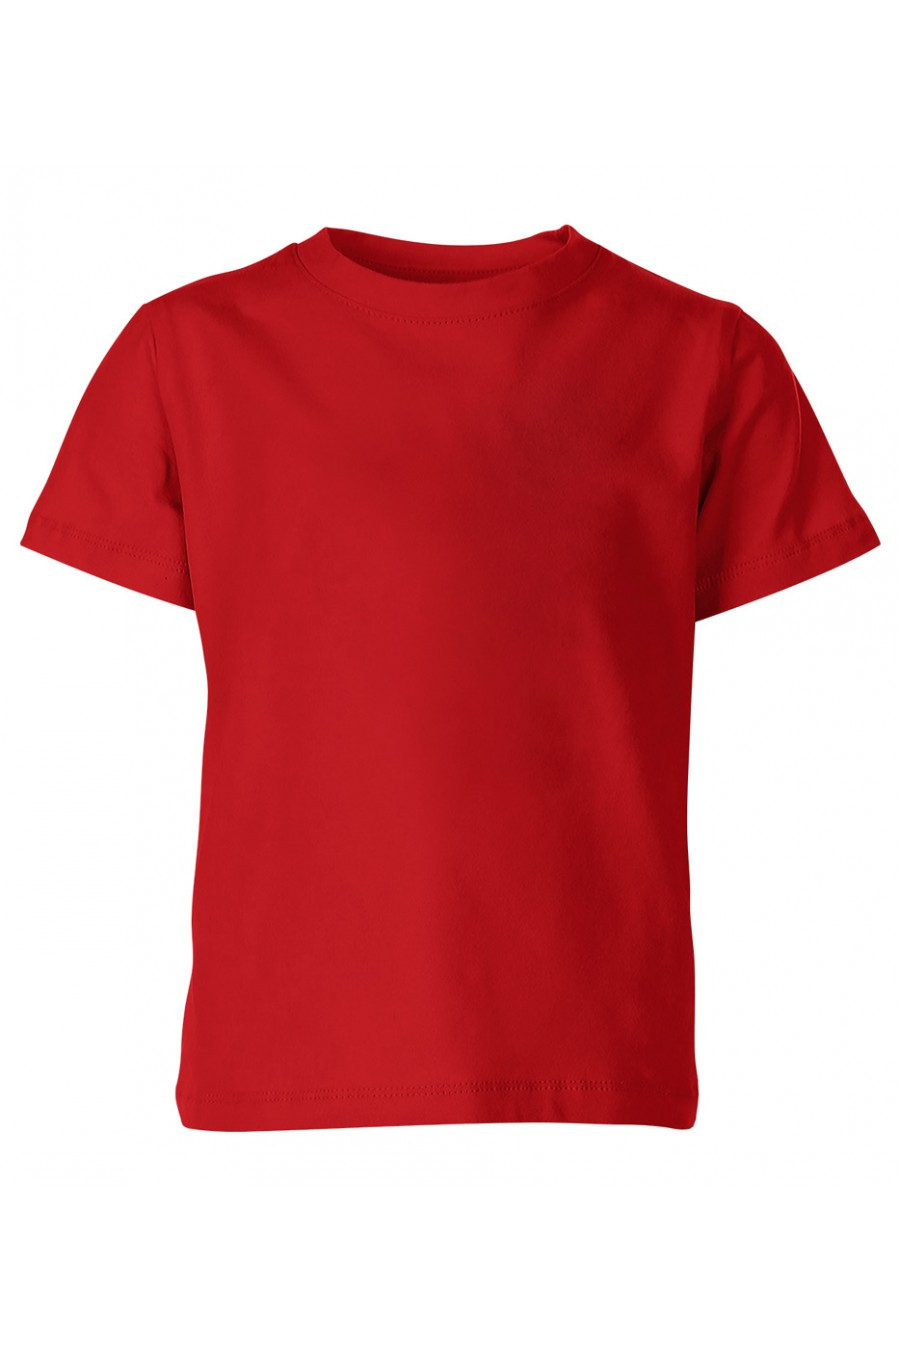 Koszulka Dziecięca Koci Grabarz